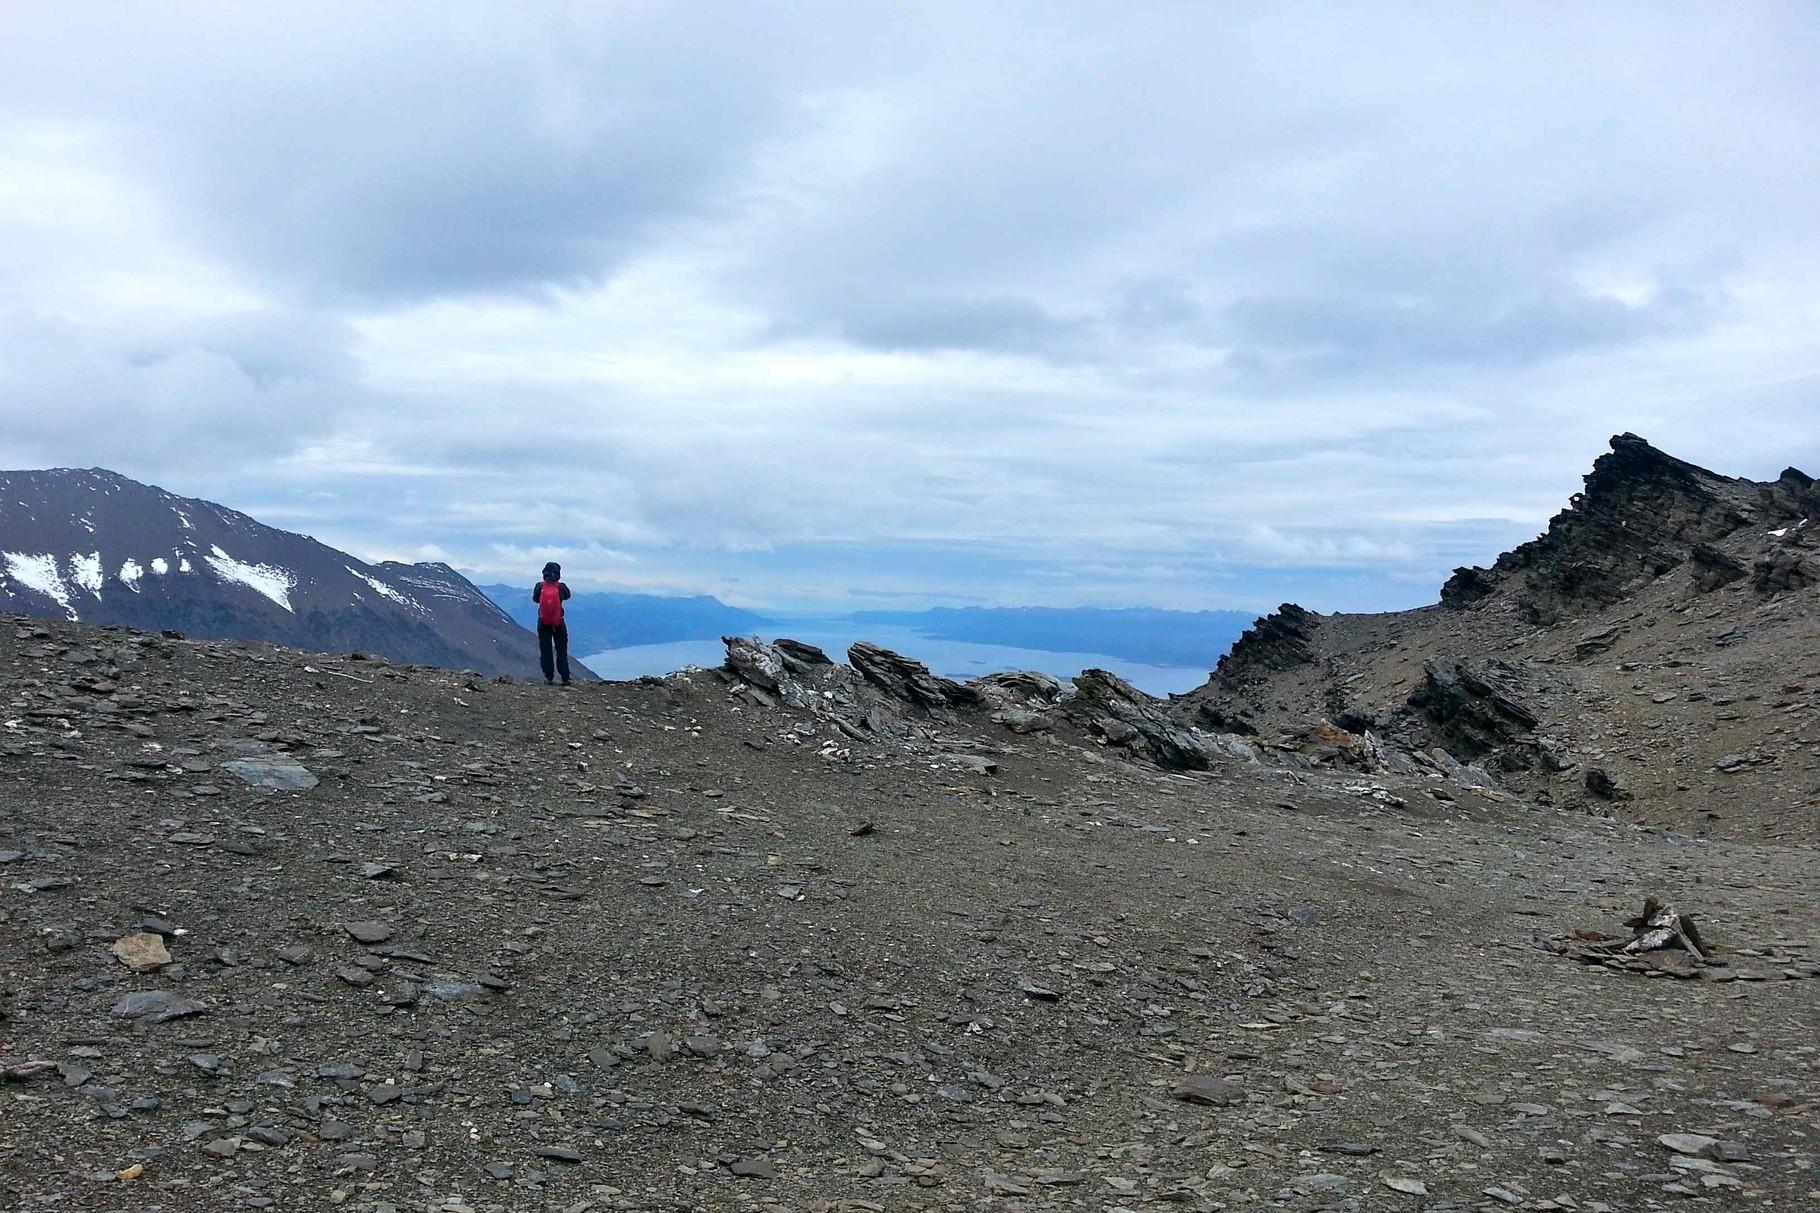 Februar 2015, Ushuaia, Argentina